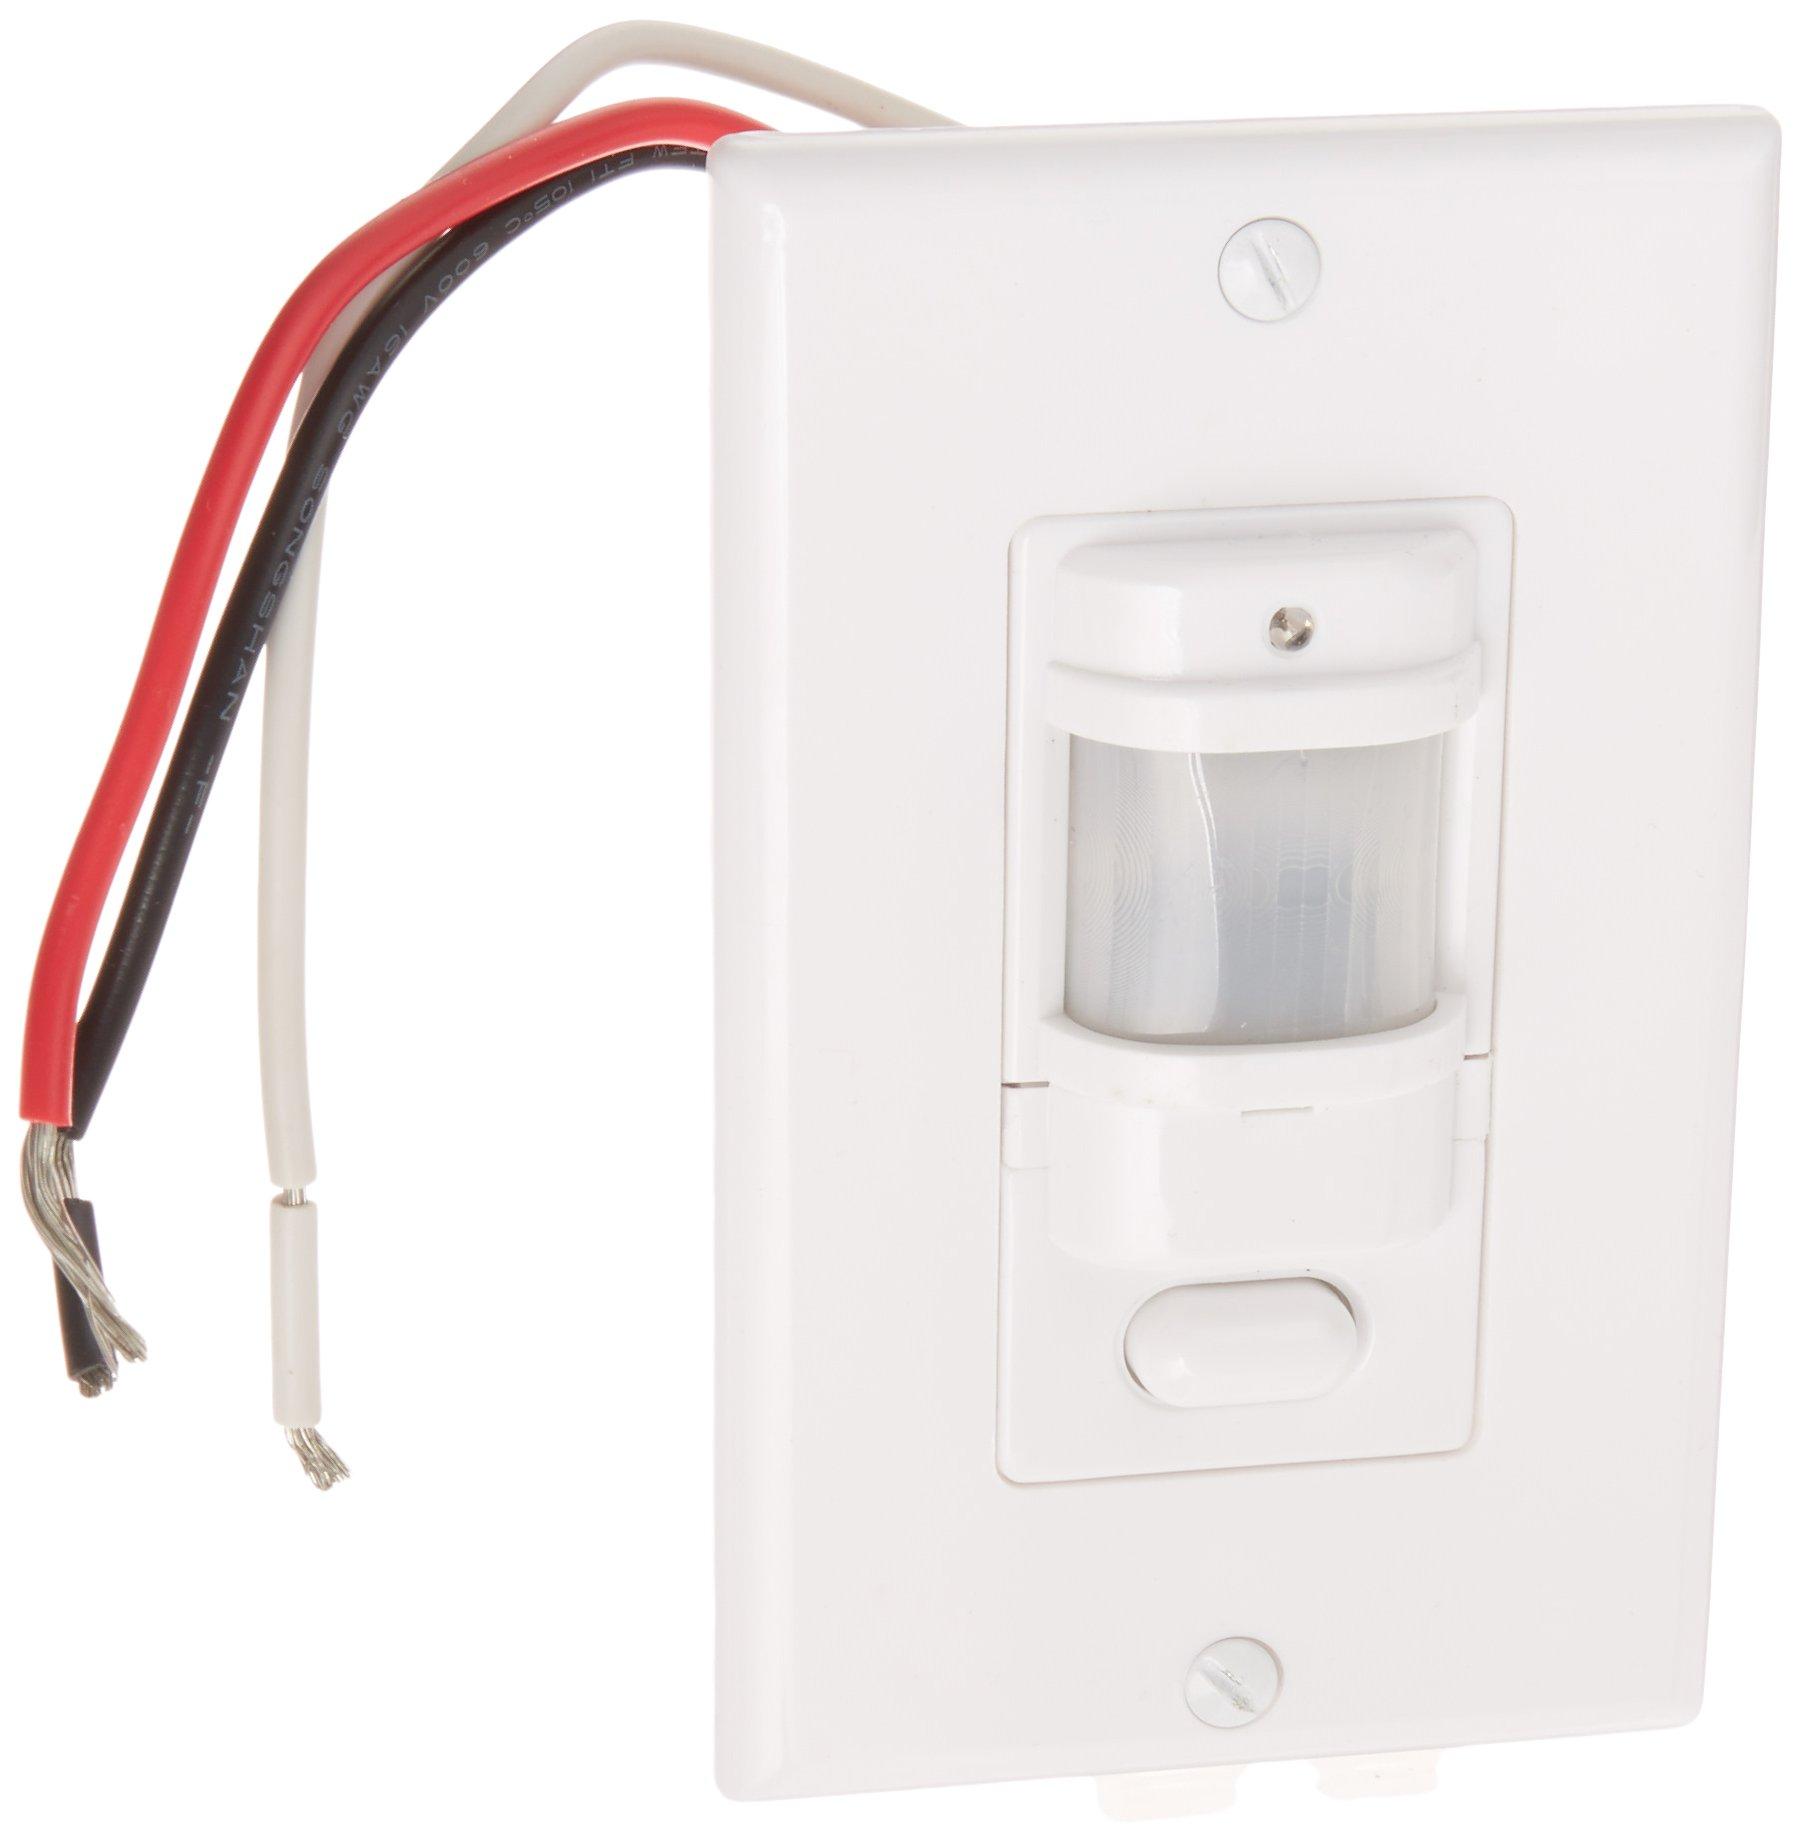 RAB Lighting LOS800W/120 Occupancy Sensor with Decorator Wall Plates, 800W Power, 120V, White